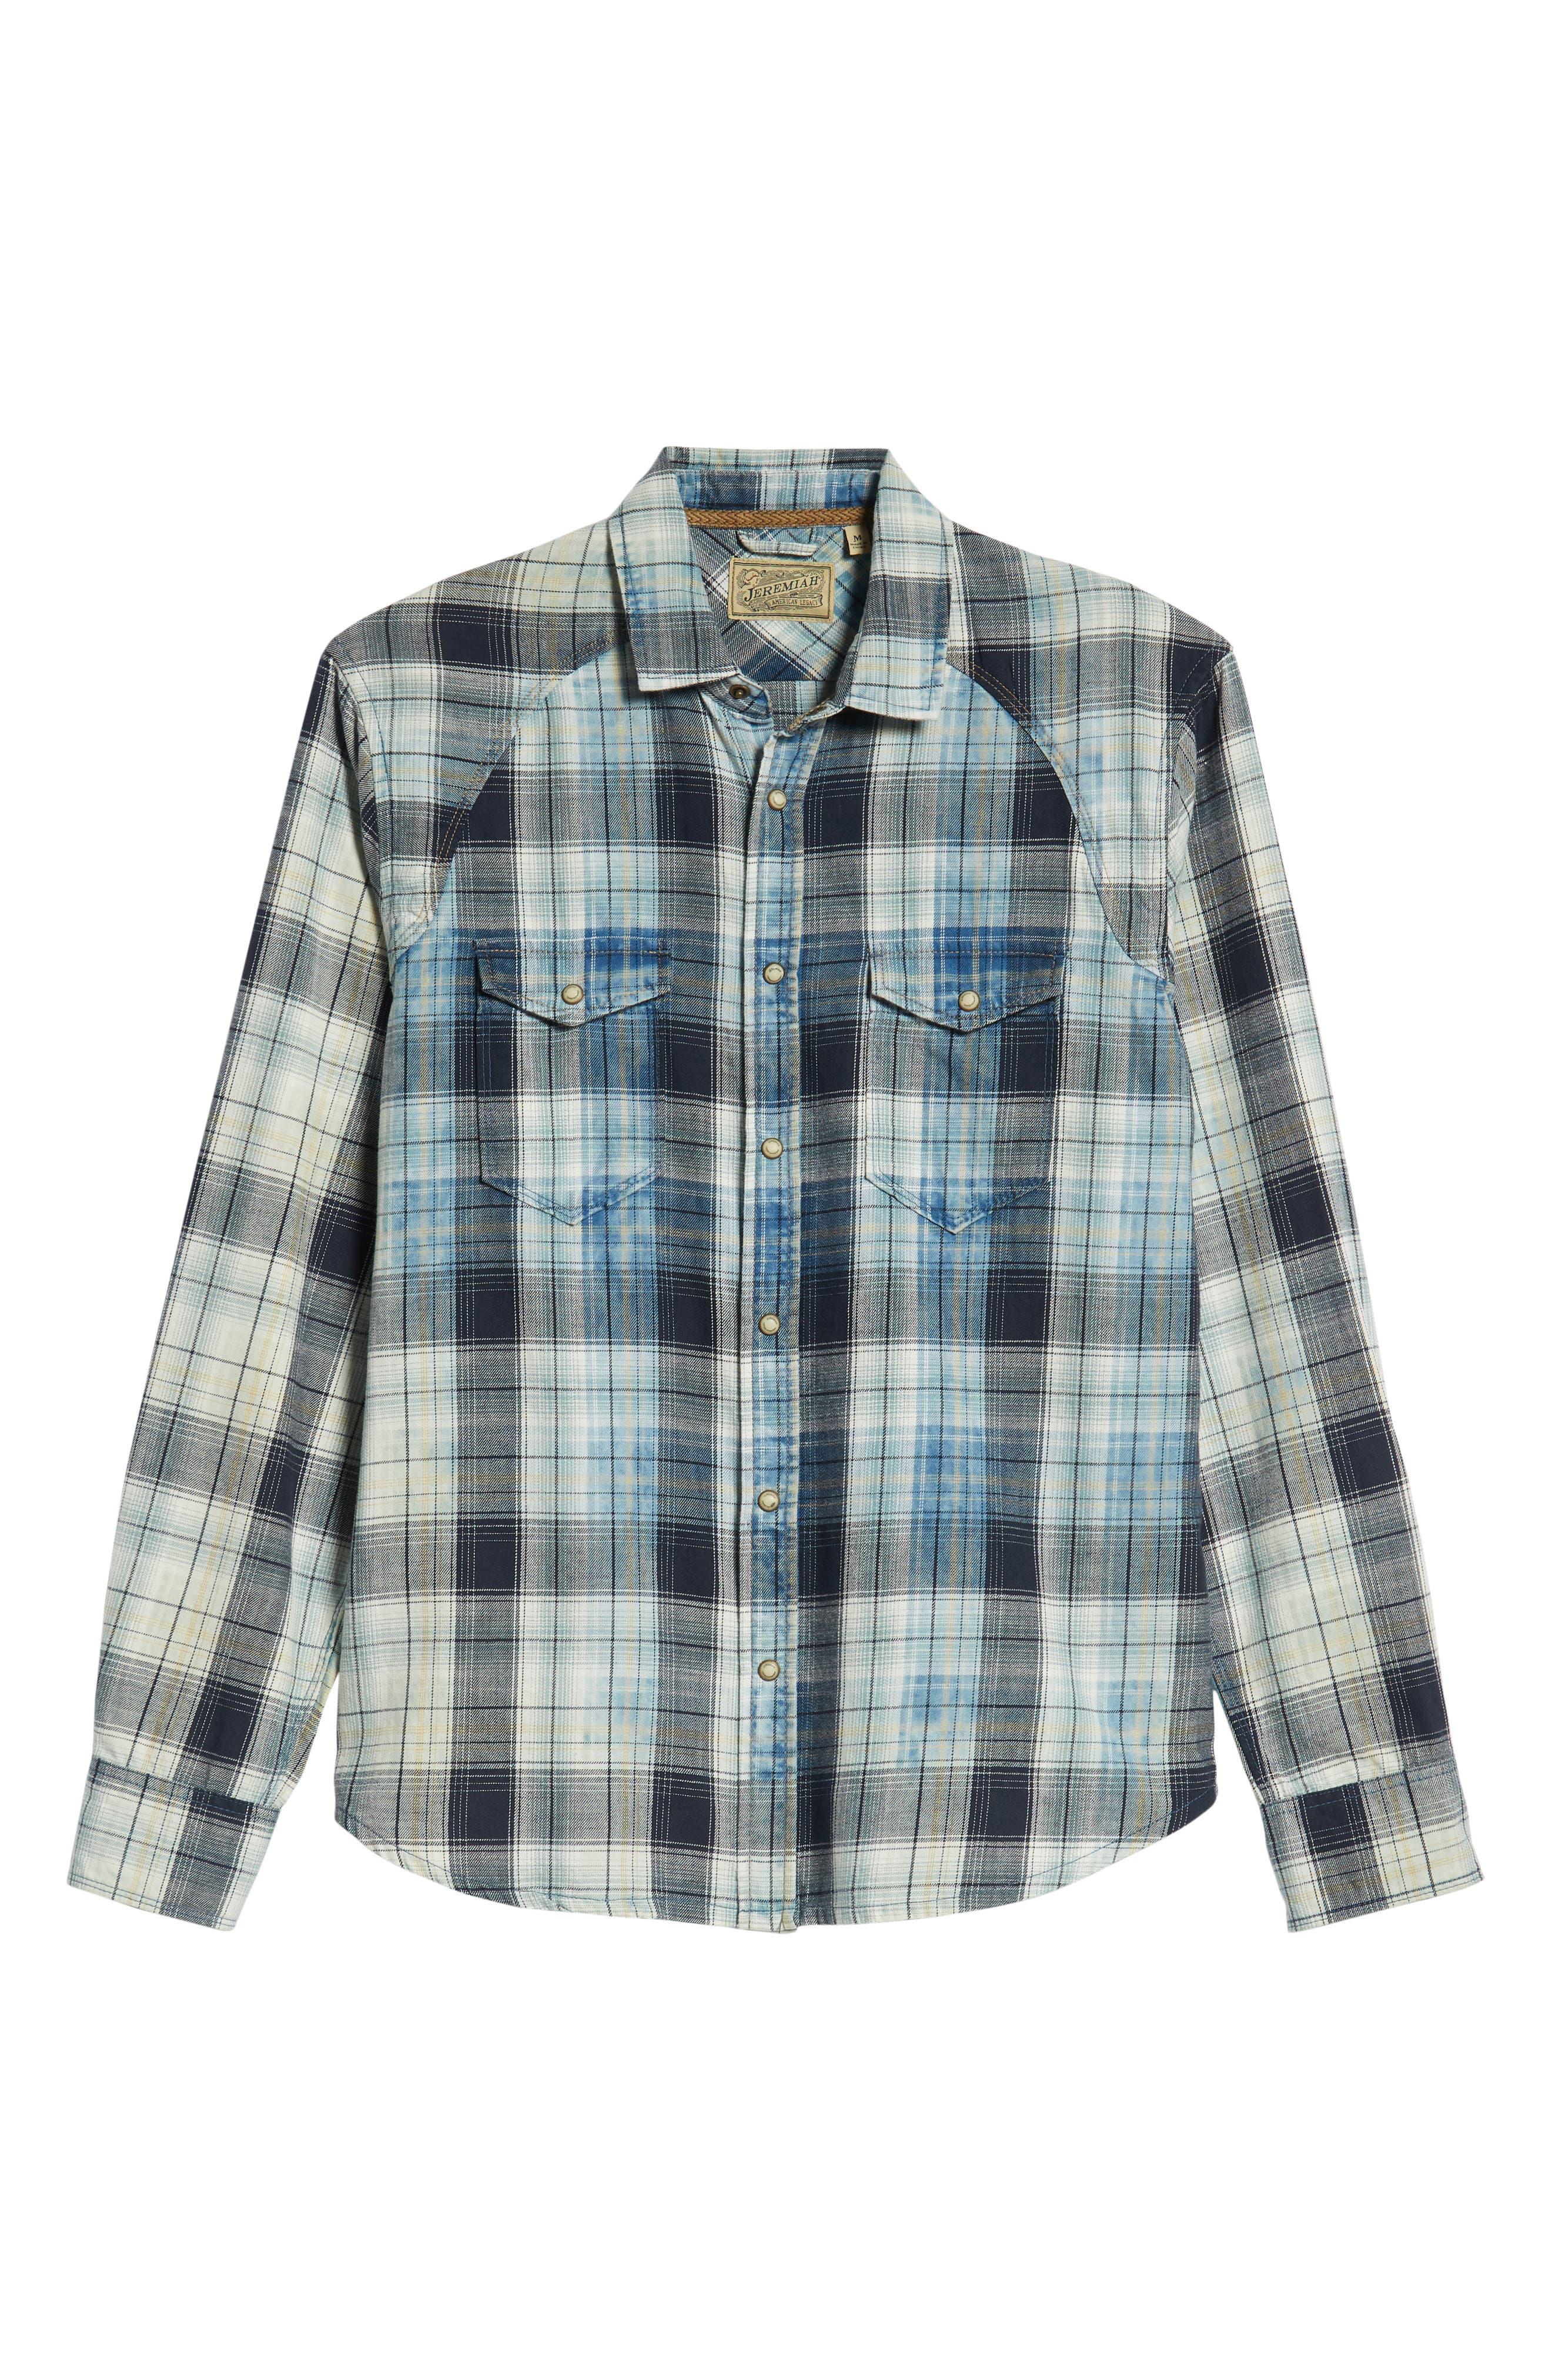 Sawtooth Regular Fit Crosshatch Plaid Shirt,                             Alternate thumbnail 5, color,                             ENSIGN BLUE